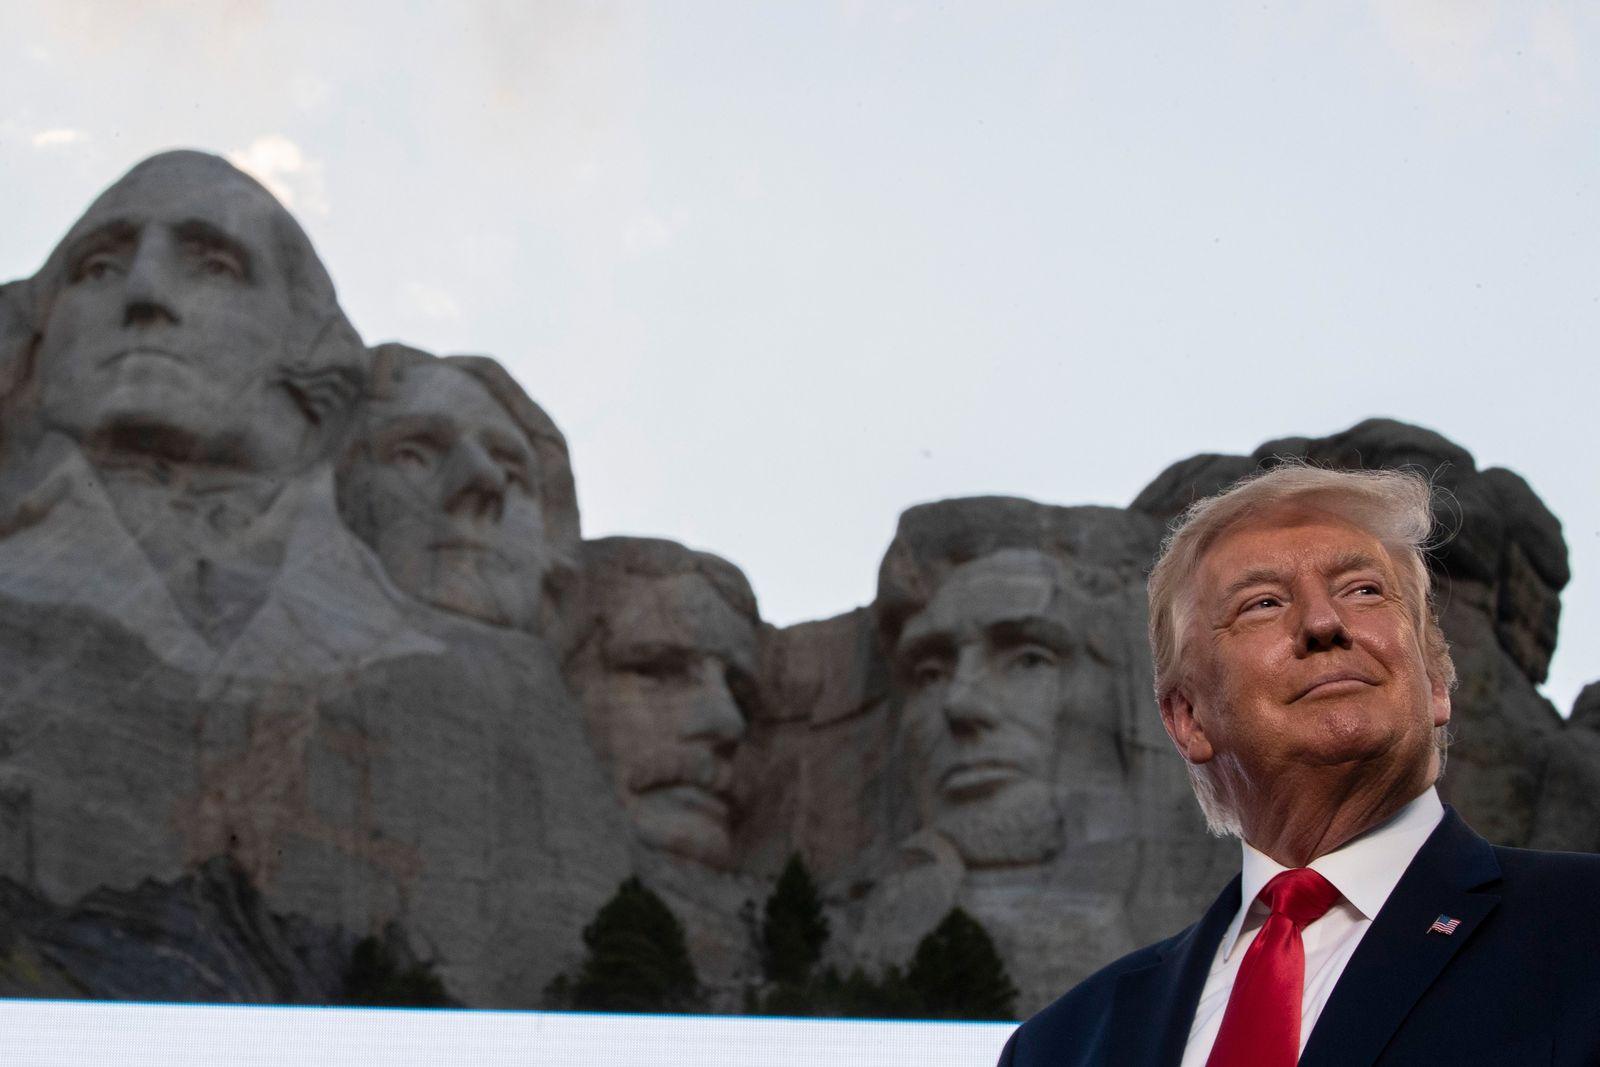 Trump besucht Mount Rushmore National Memorial